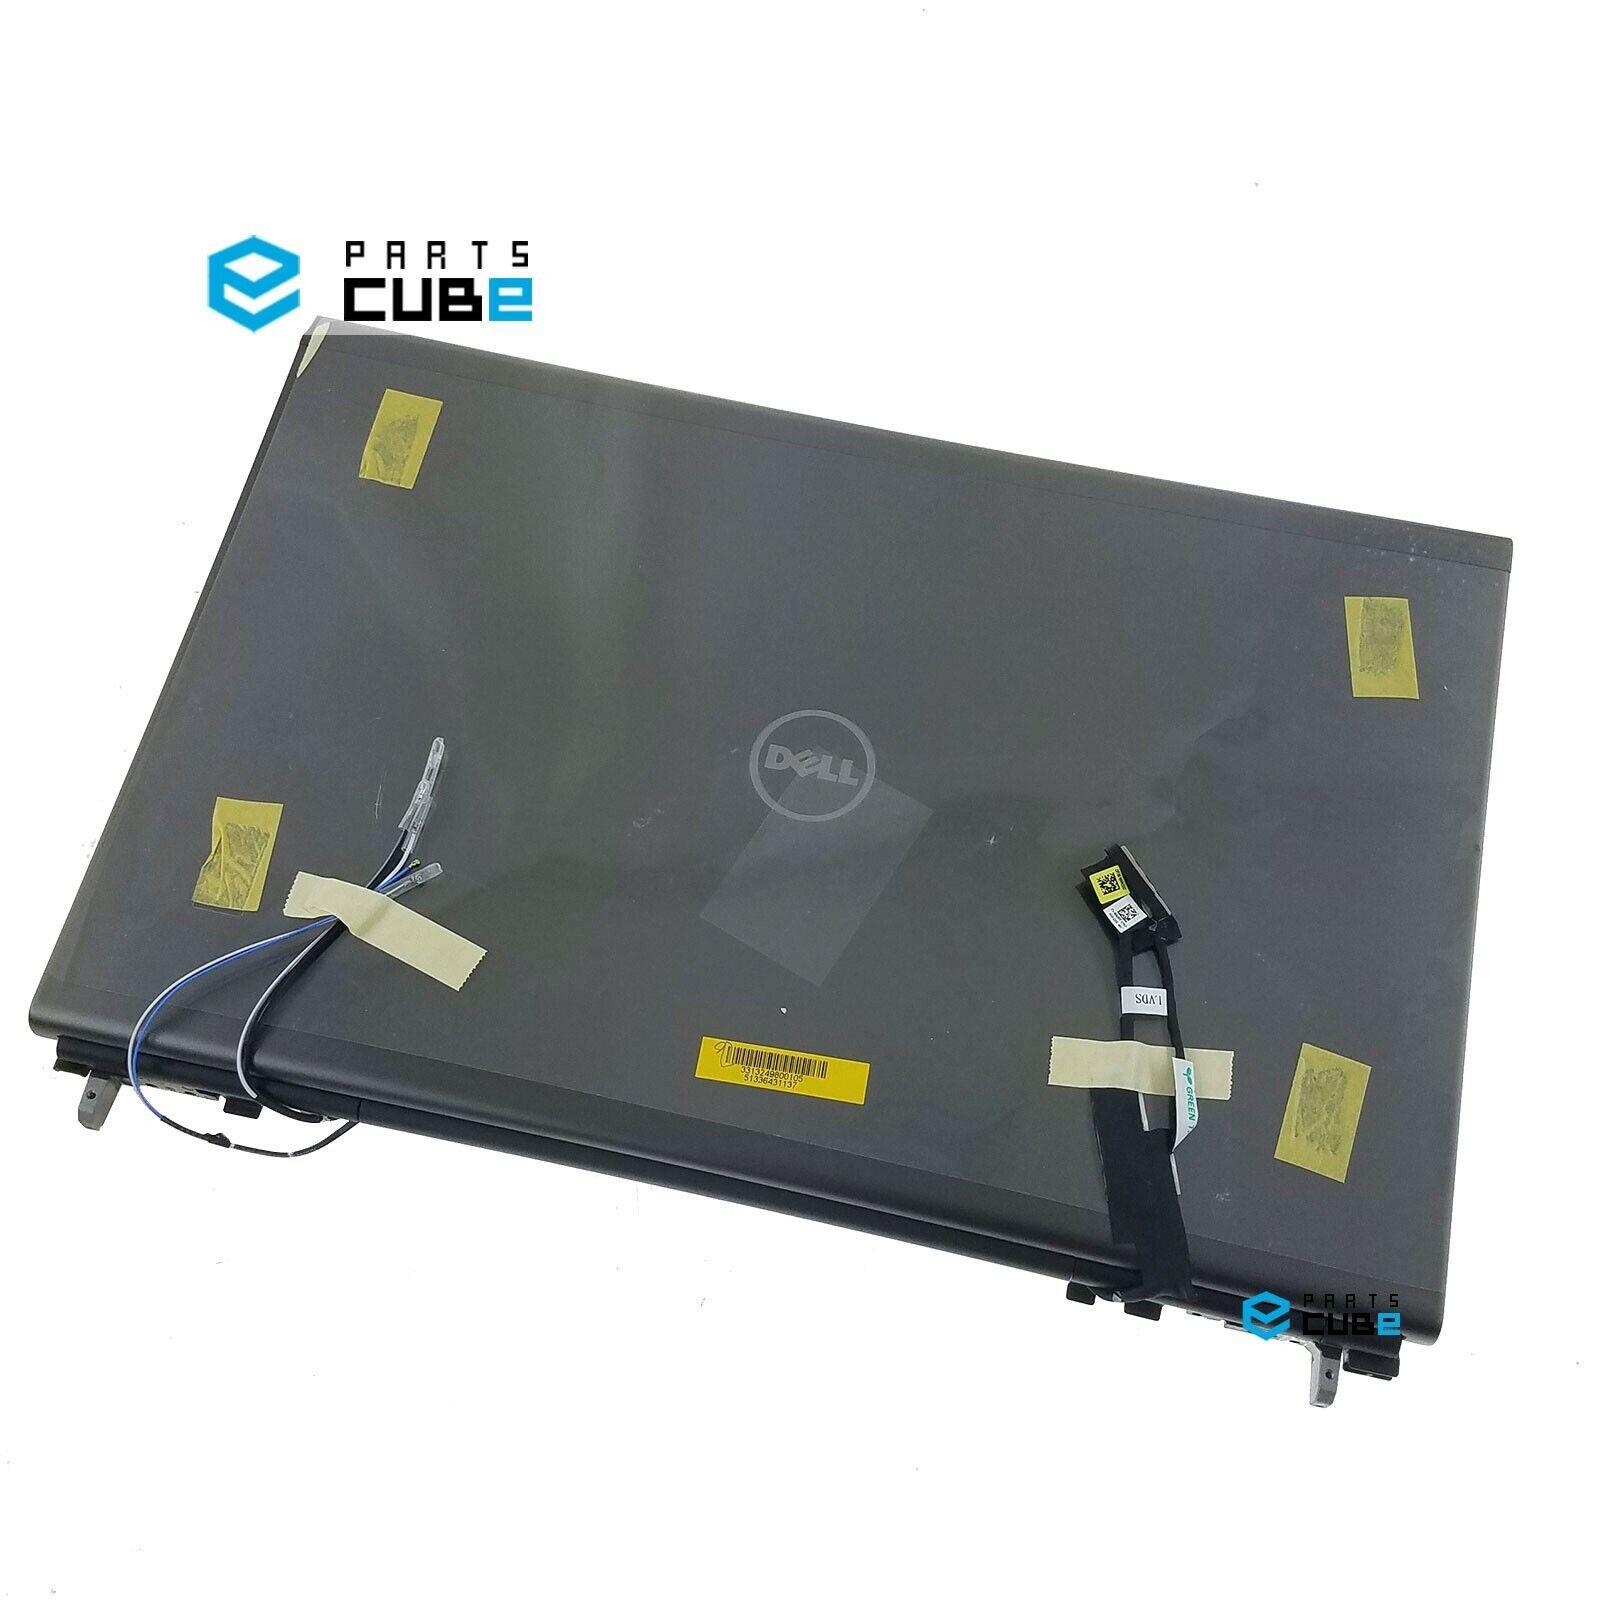 U776G Covet Orange U776G Dell Precison M6400 17 WUXGA RGB Edge To Edge LED Back-Lit Complete LCD Screen Panel Assembly